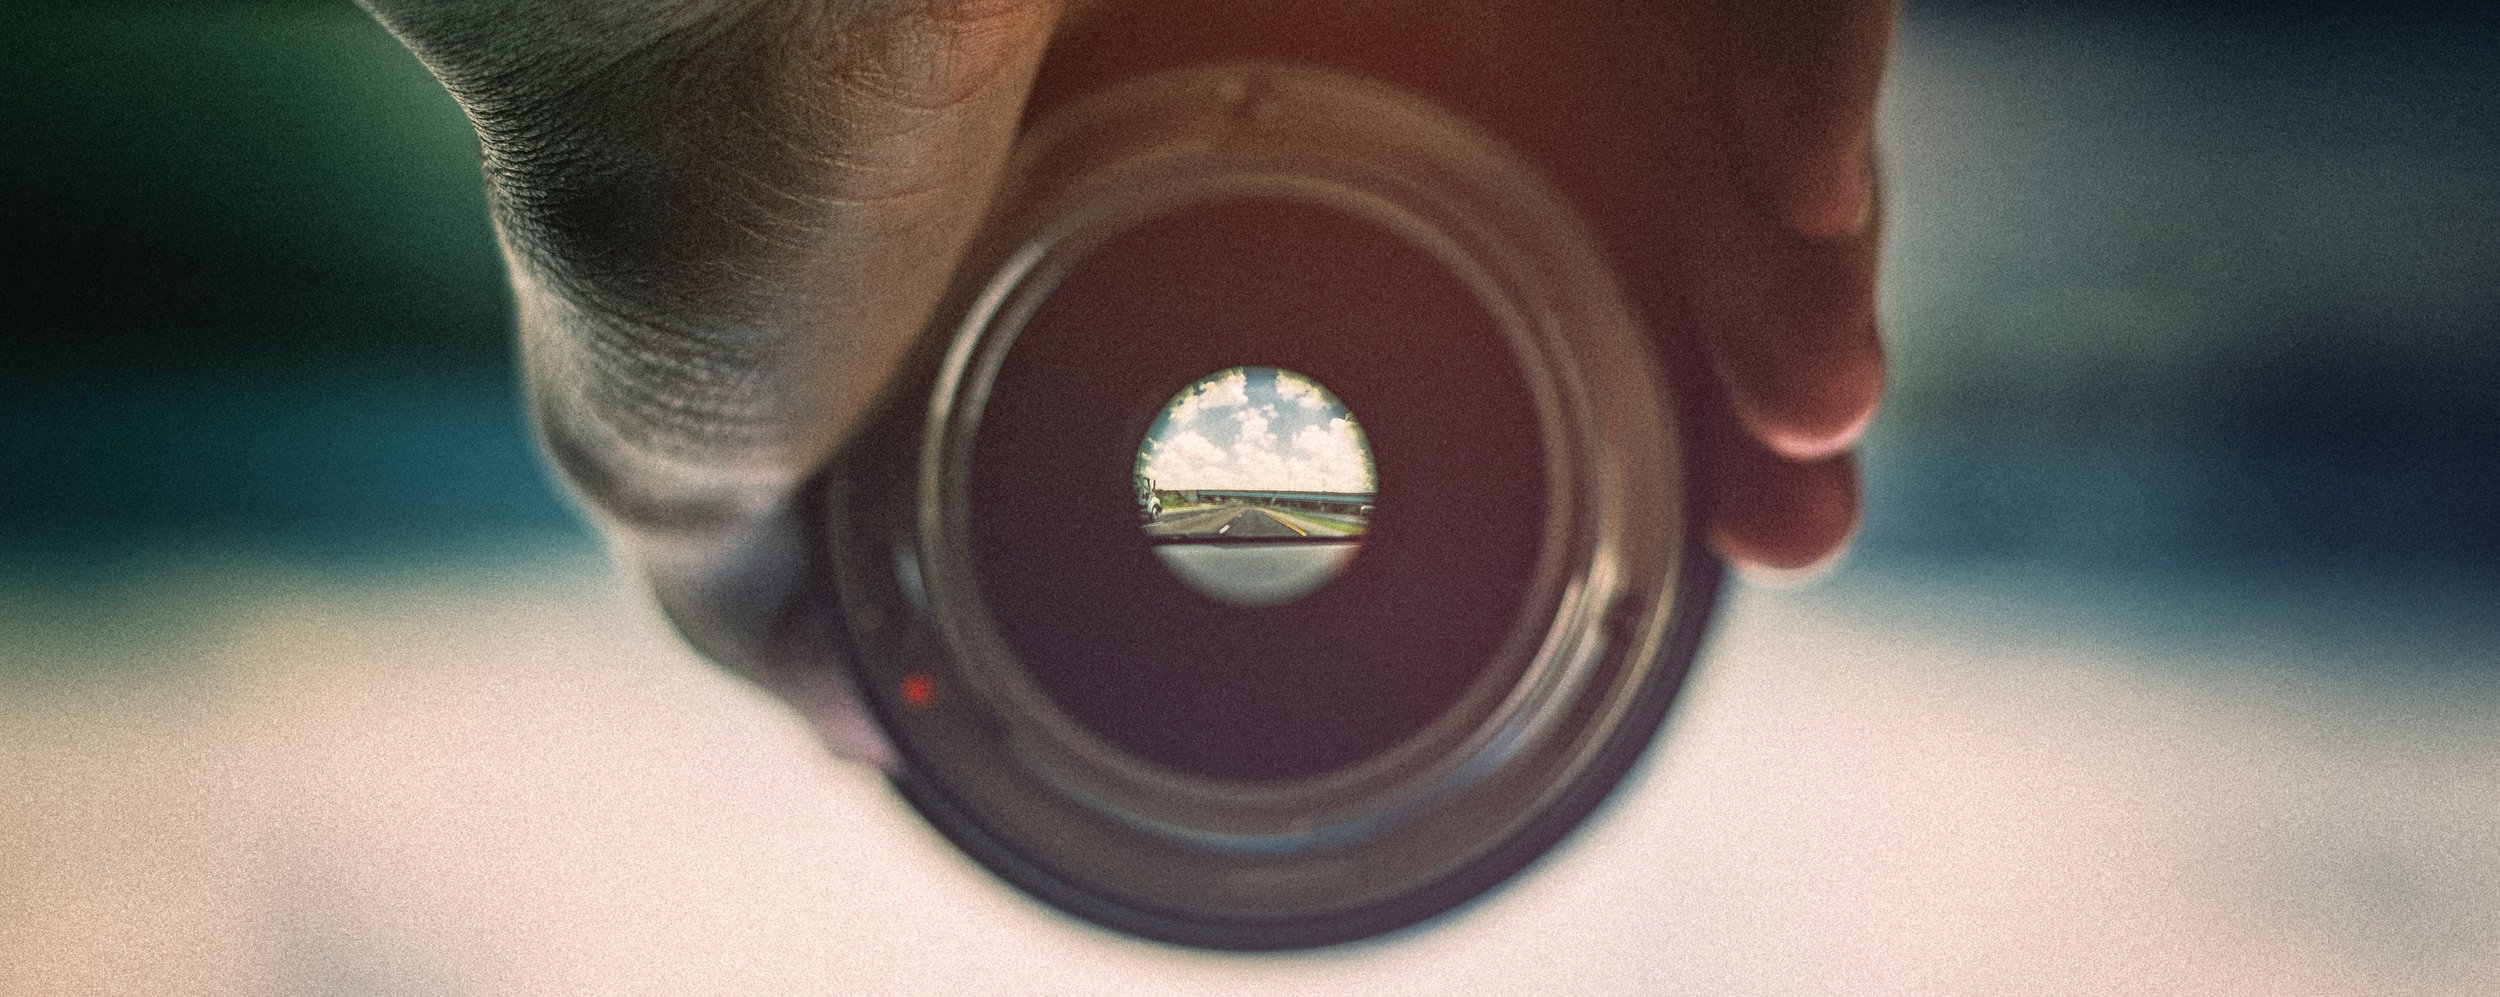 Camera Lens Human-Centered Design - Trig Industrial Design - Explore Prototype Build